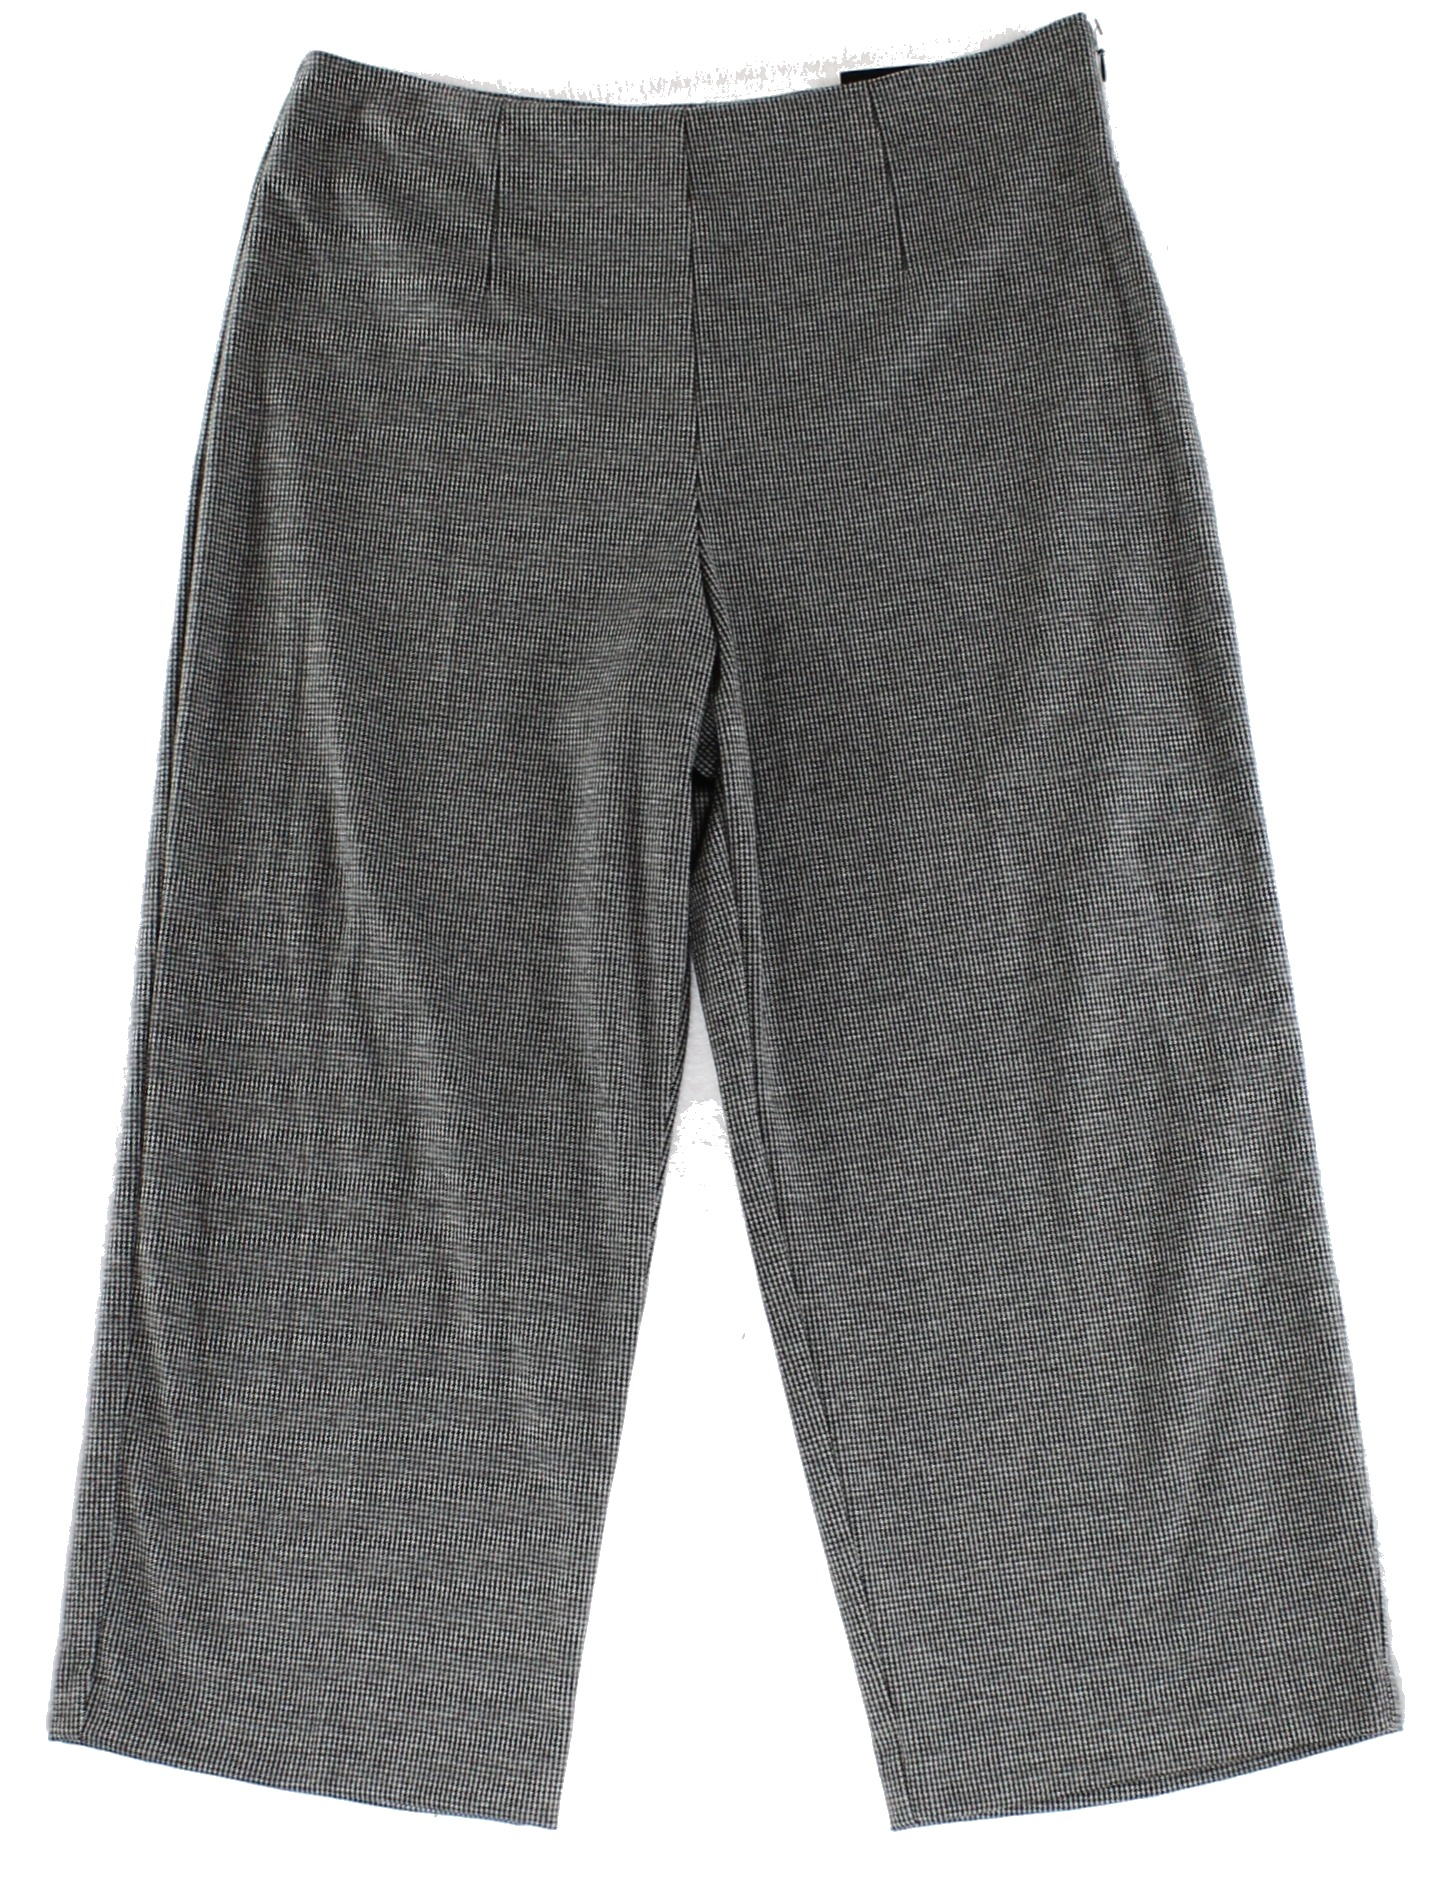 Alfani NEW Gray Black Womens Size 4 Flat-Front Houndstooth Dress Pants